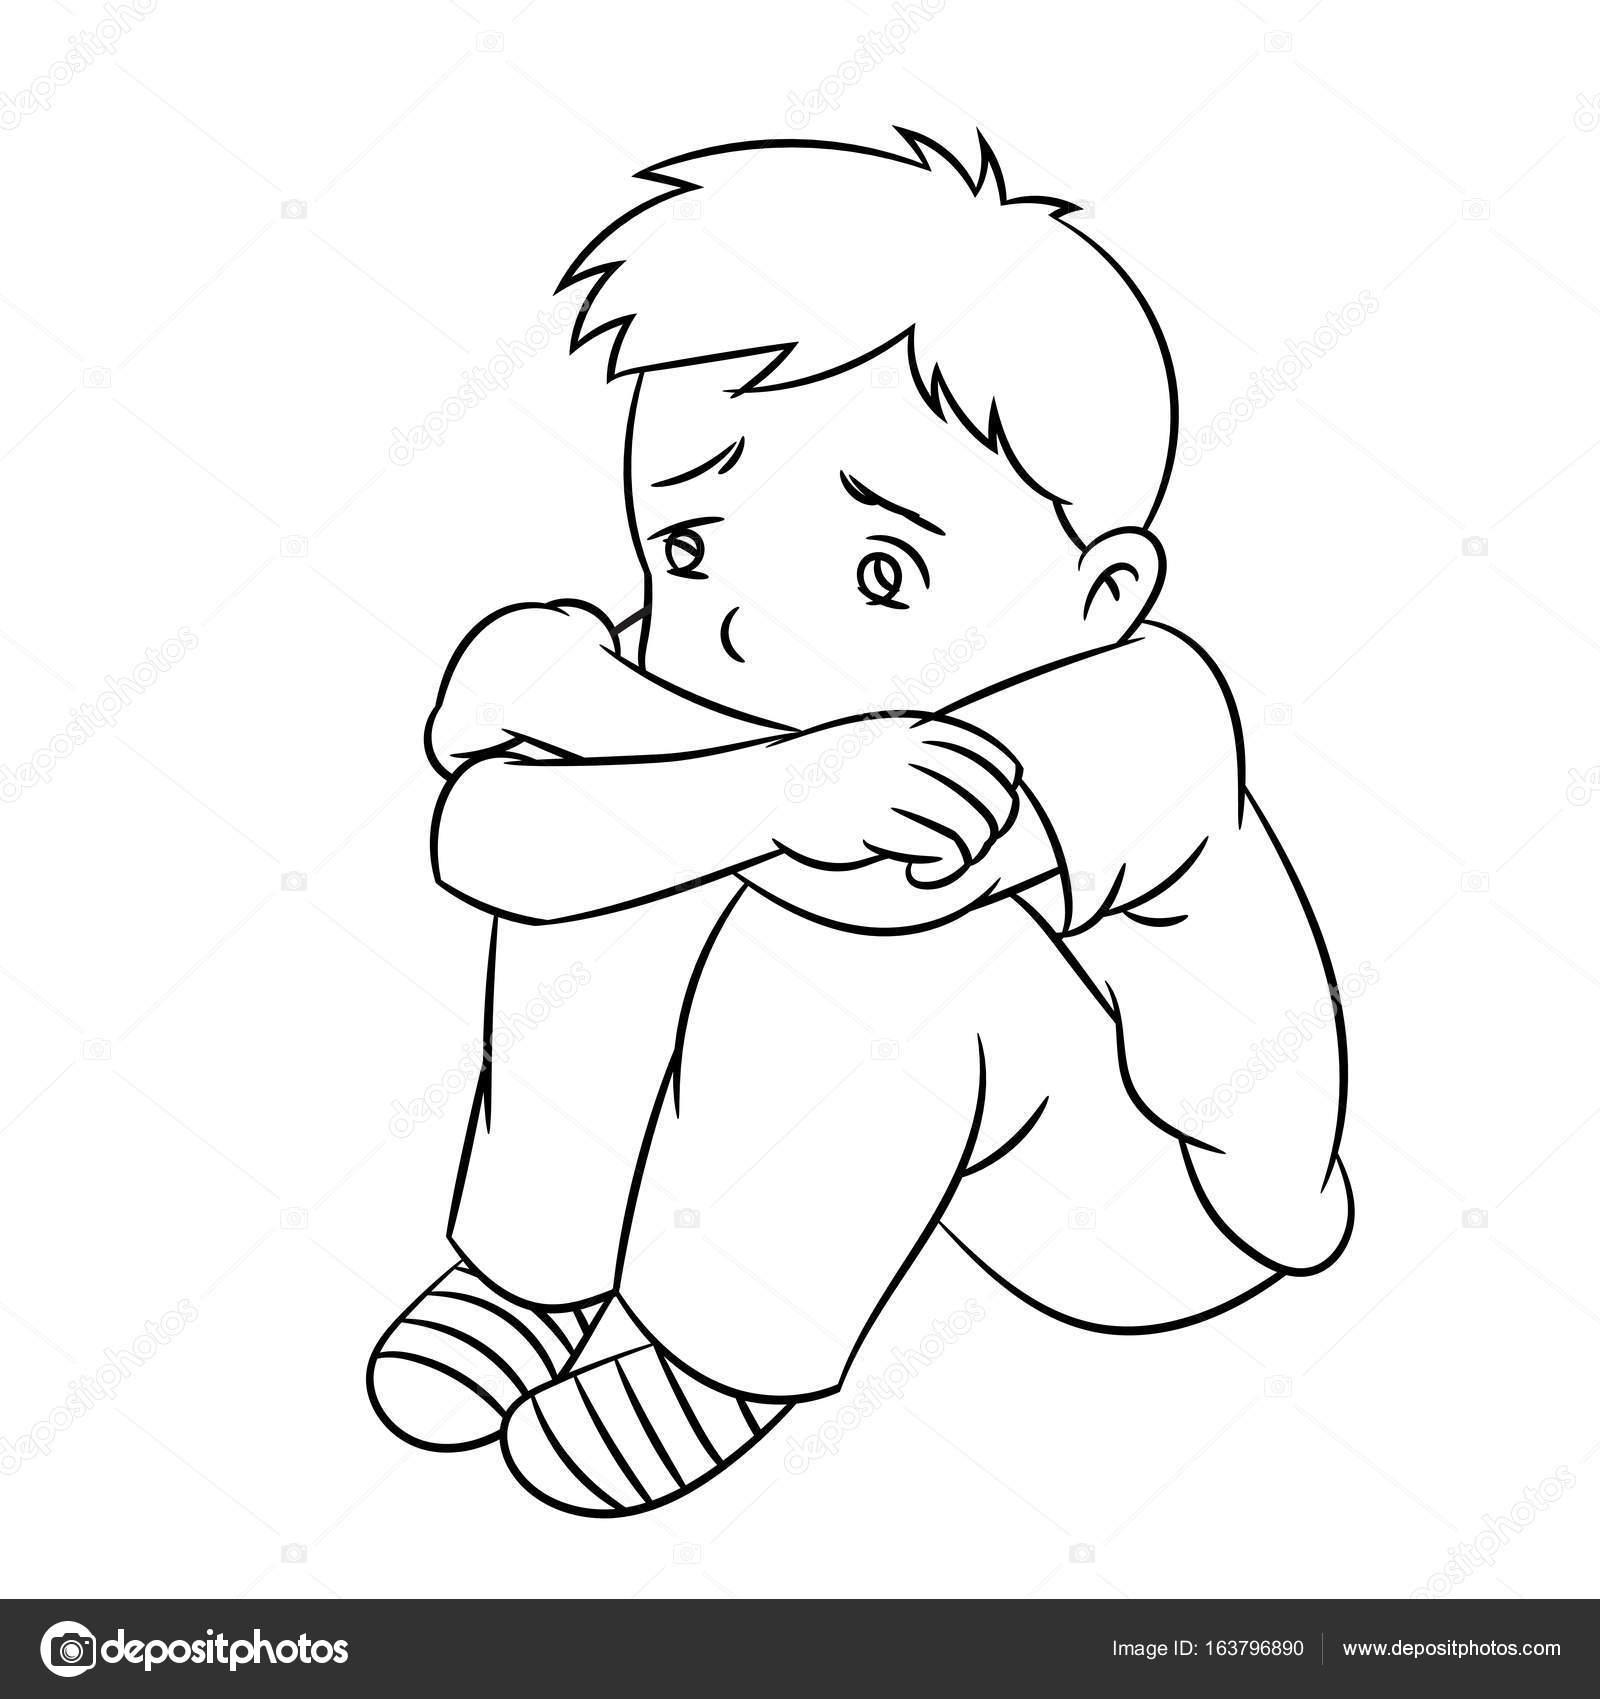 Imagenes Nino Triste Para Colorear Dibujos Animados De Chico